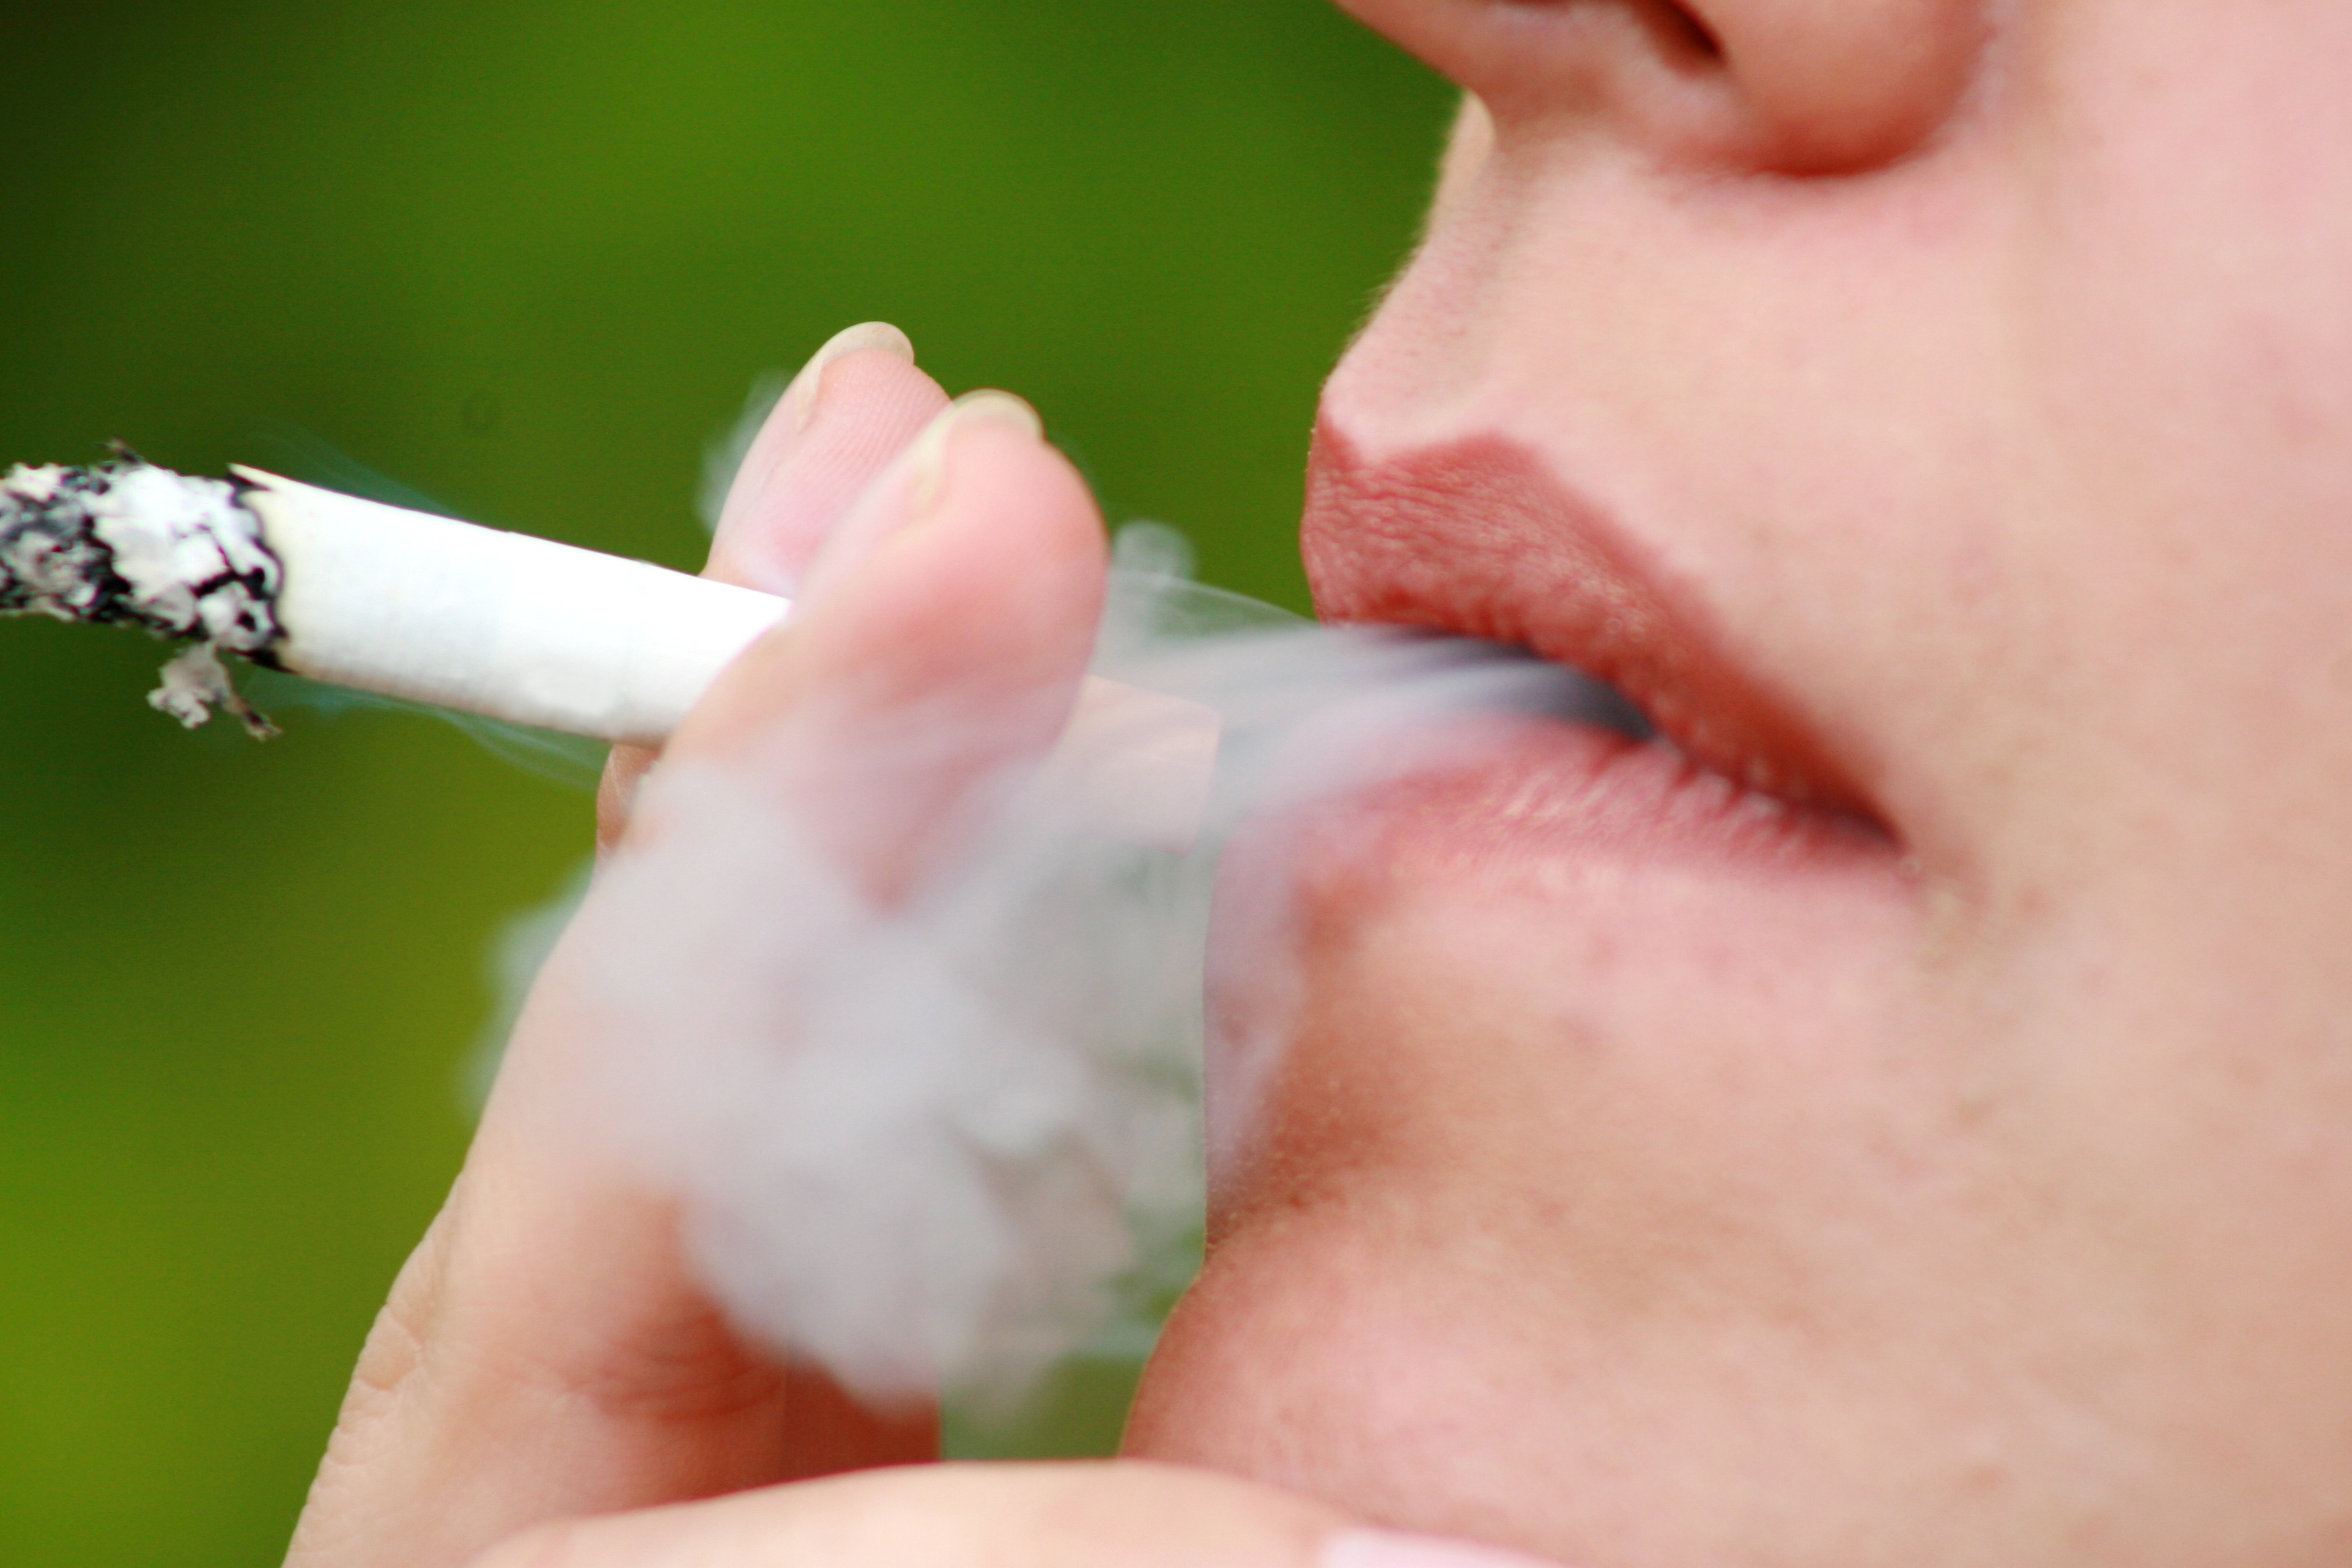 taba 957705112 - Enfermedades por tabaquismo mata a más de 100 mexicanos al día